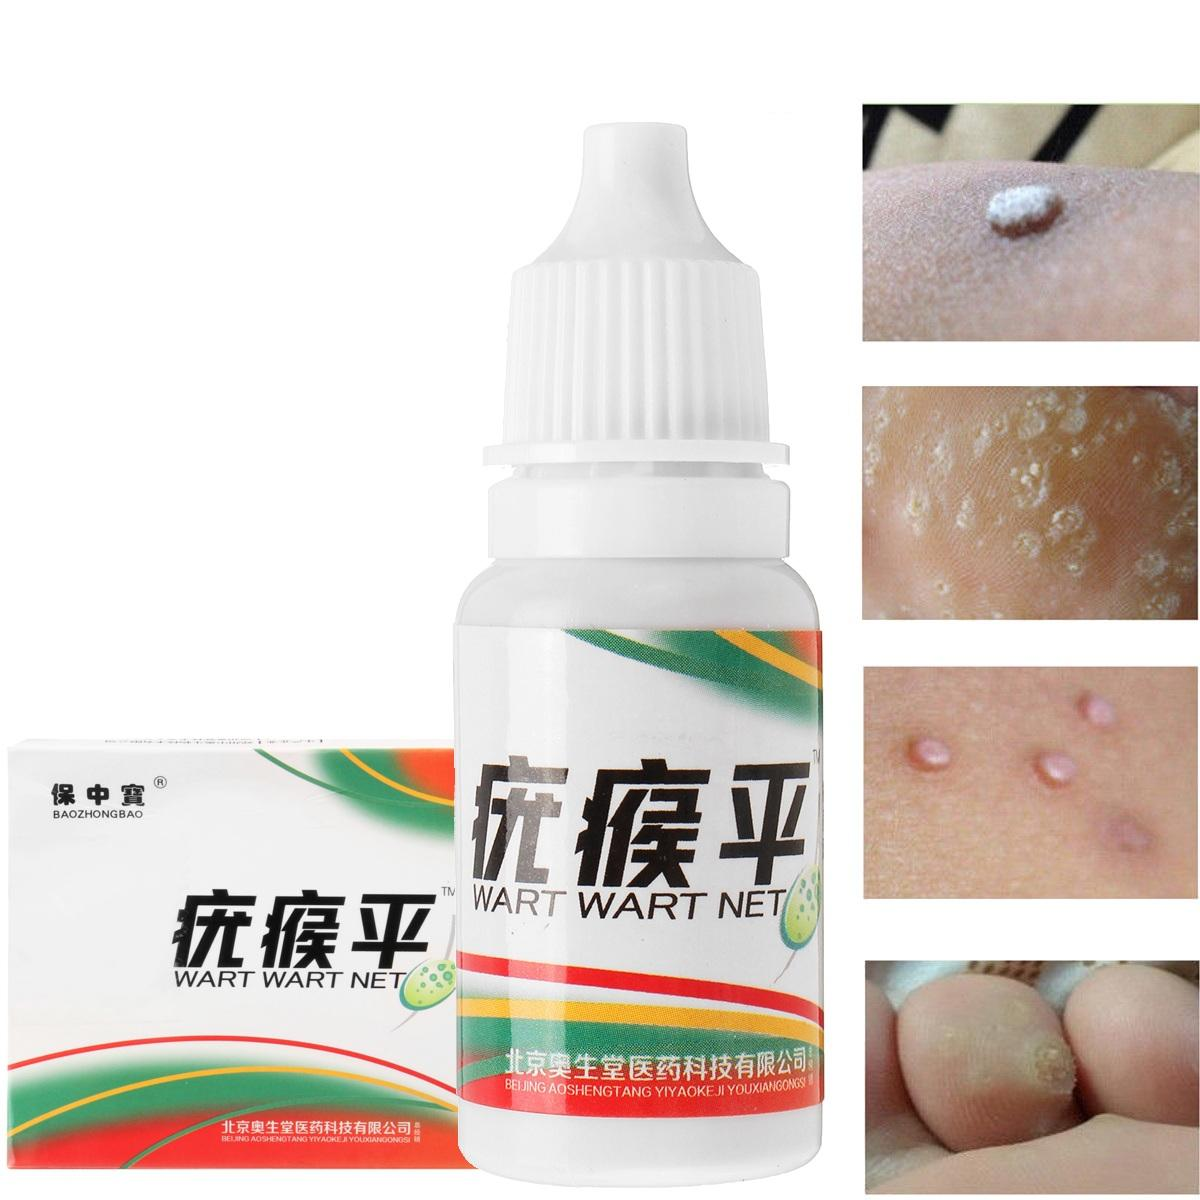 wart medicine on skin tags